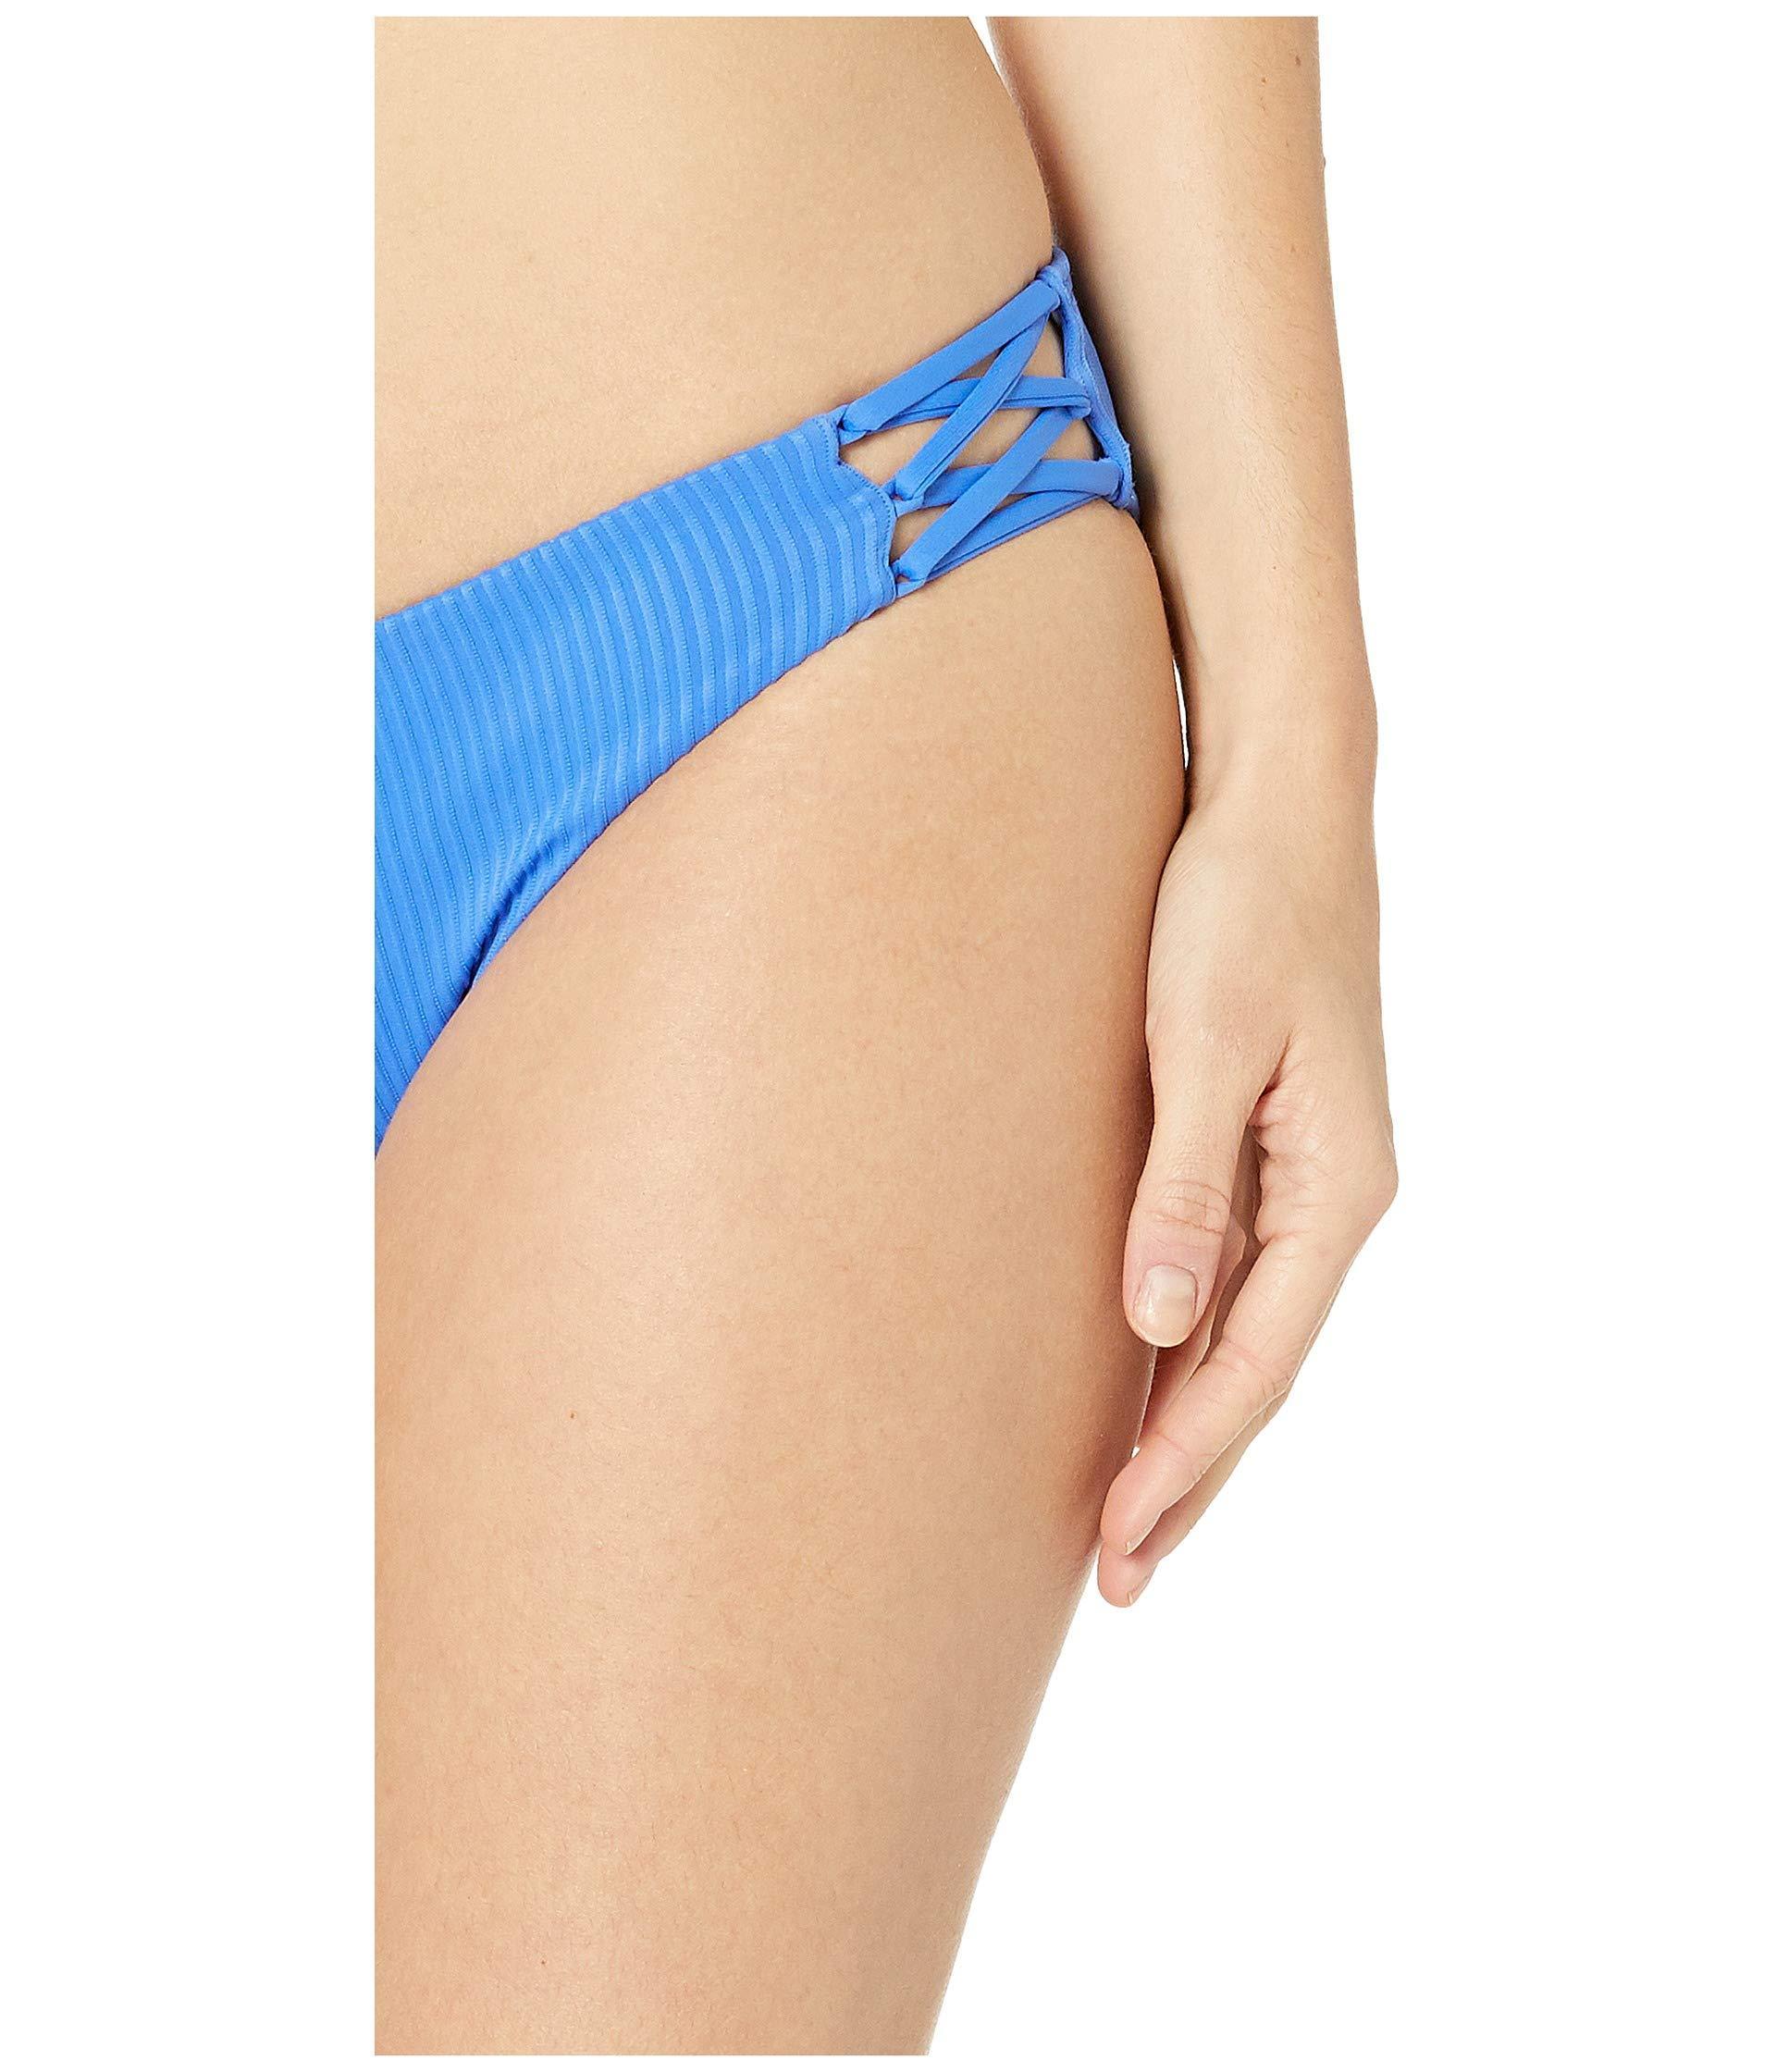 325641bac8772 Luli Fama Orillas Del Mar Ribbed Seamless Triangle Top (blue My Mind)  Women's Swimwear in Blue - Lyst